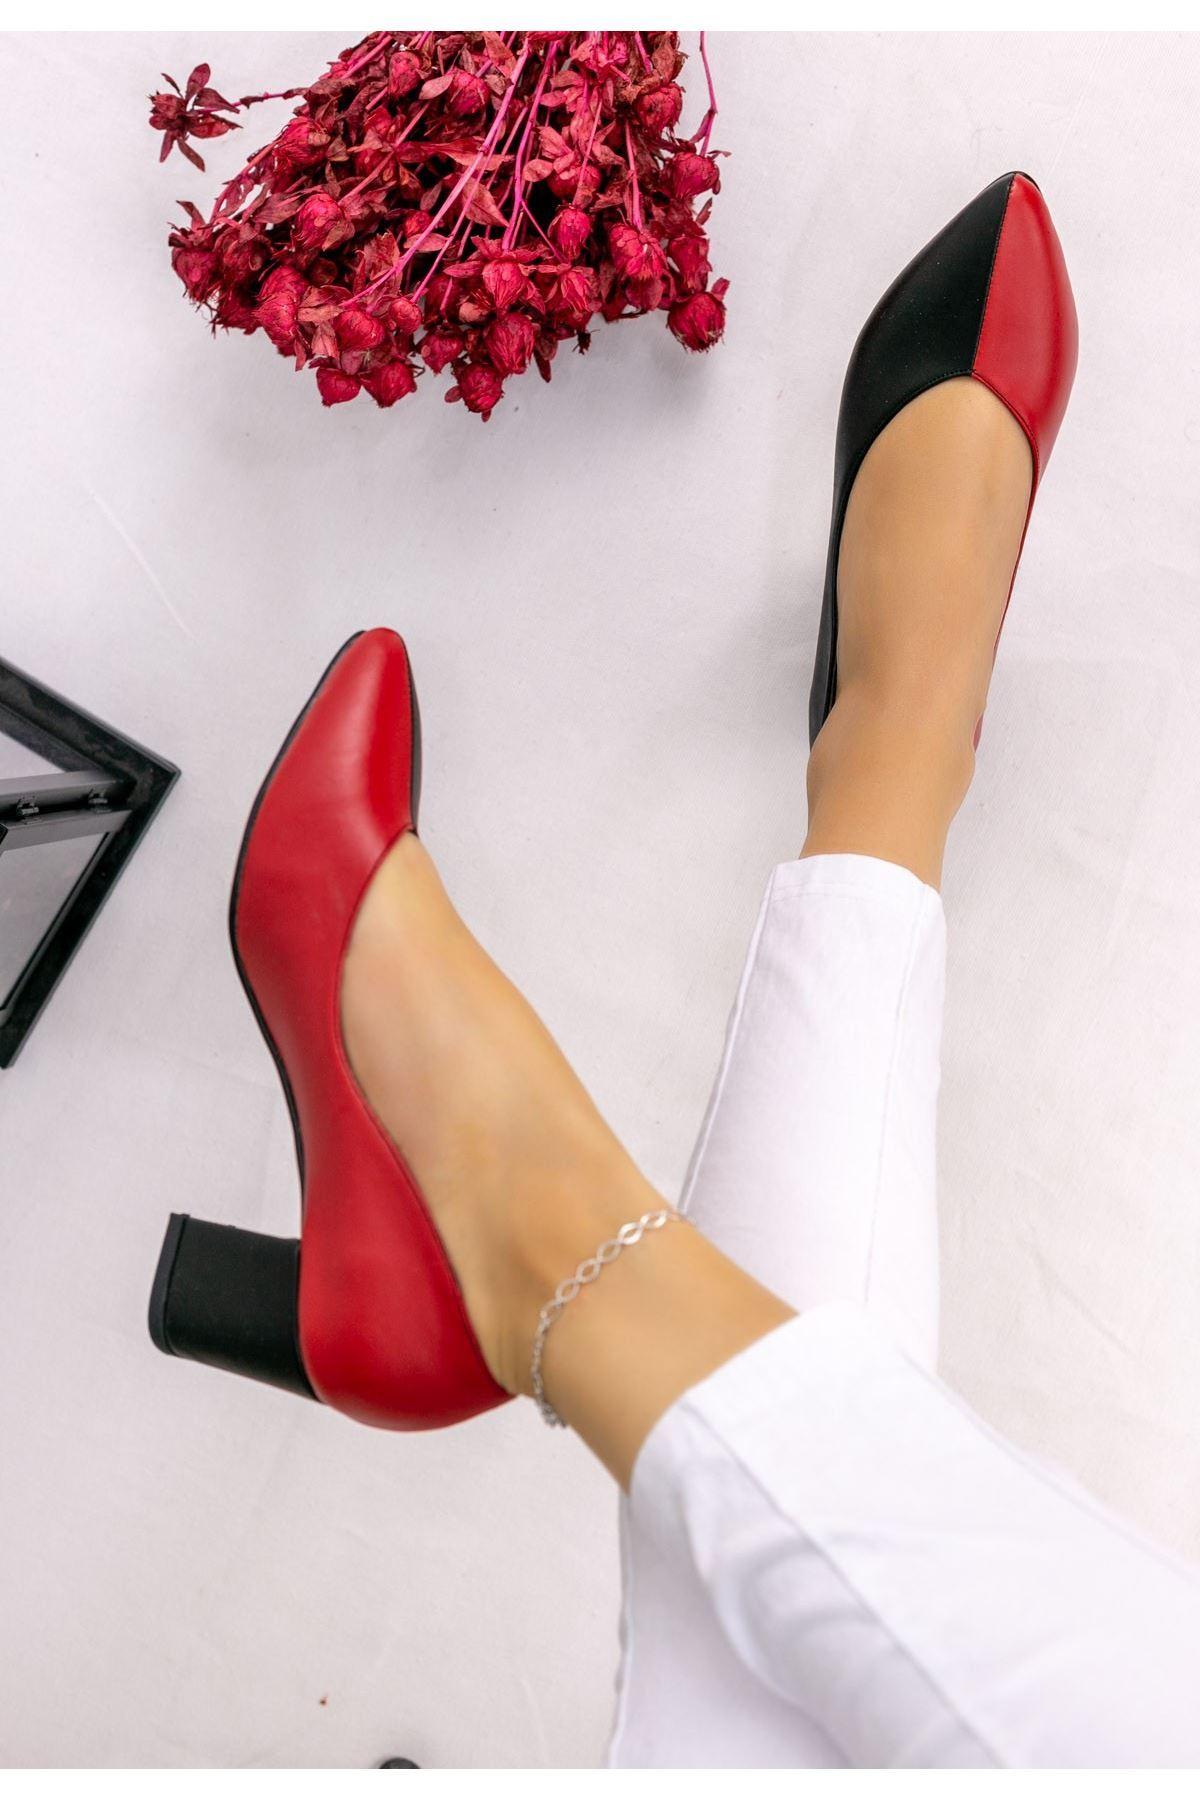 Vilo Siyah Kırmızı Cilt Siyah Topuklu Ayakkabı